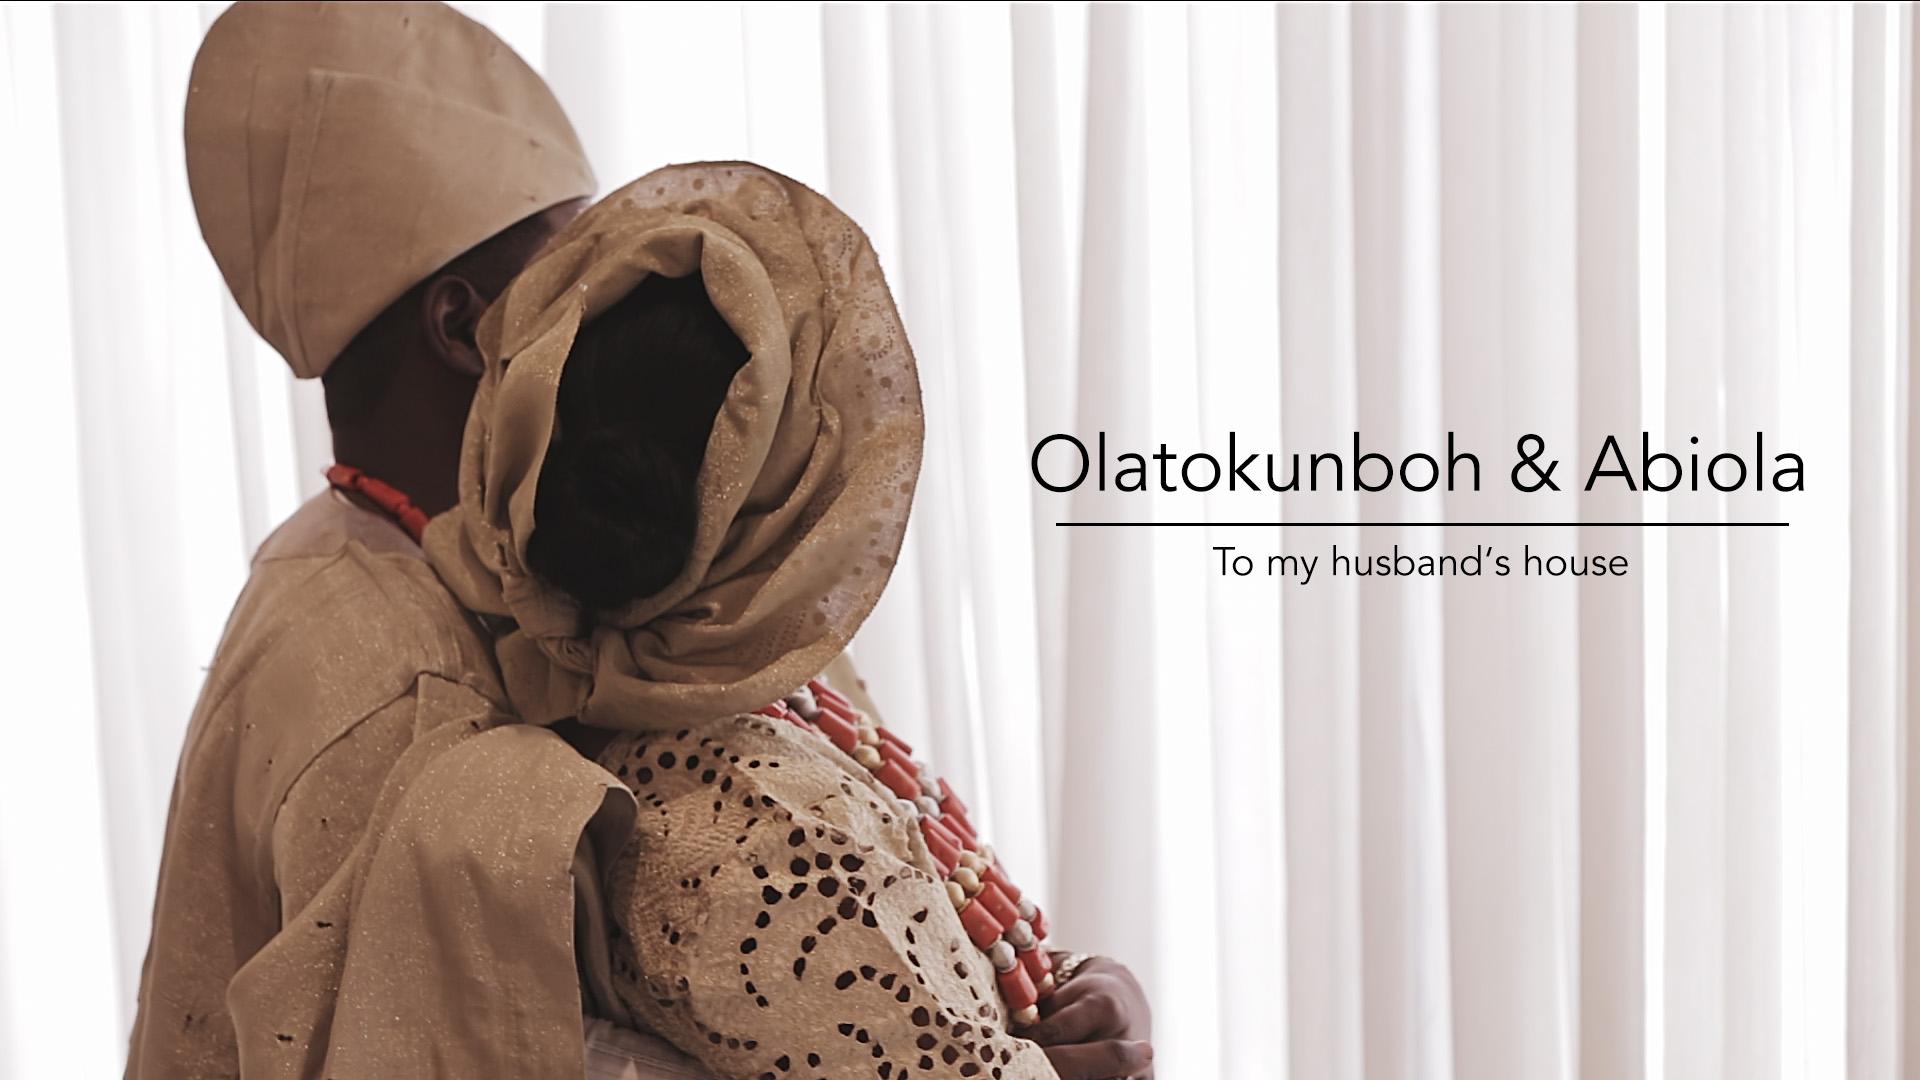 Olutakunboh + Abiola | Mississauga, Canada | Roma's Hospitaly Centre